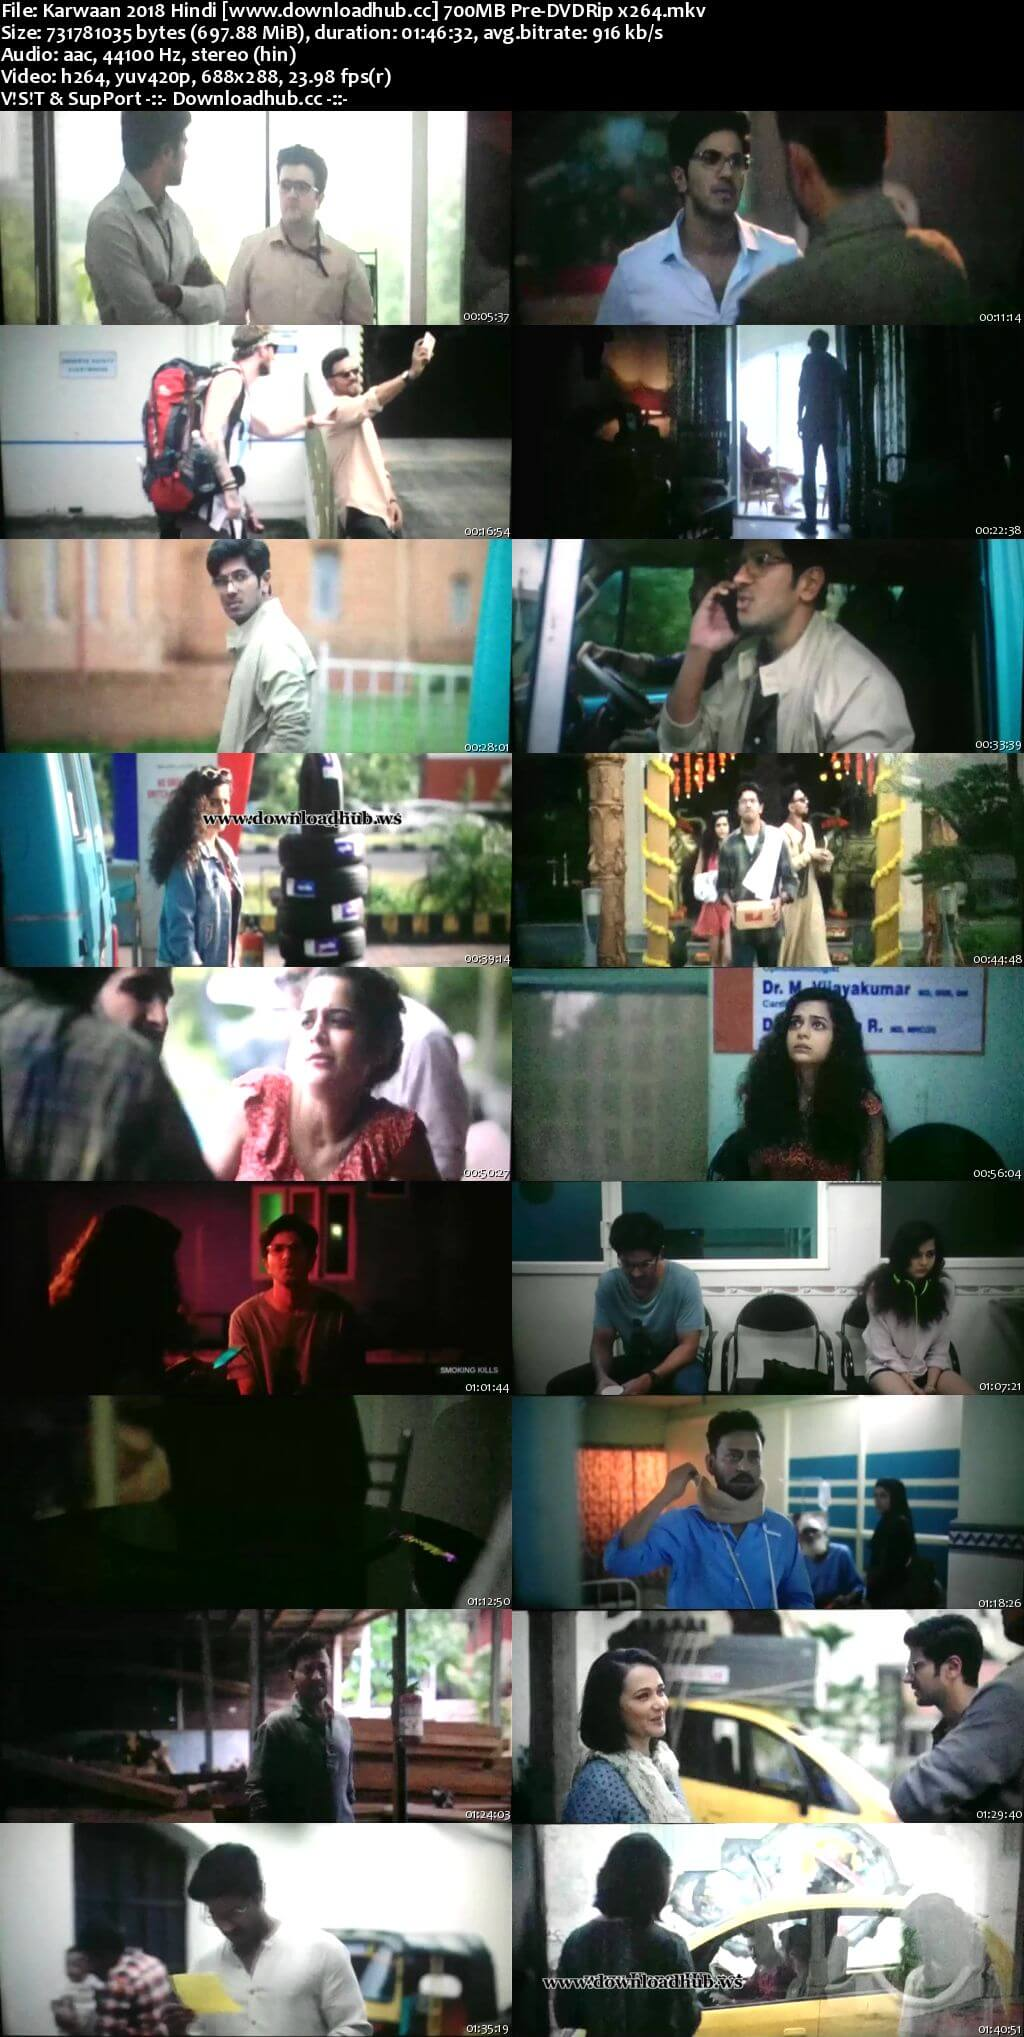 Karwaan 2018 Hindi 700MB Pre-DVDRip x264